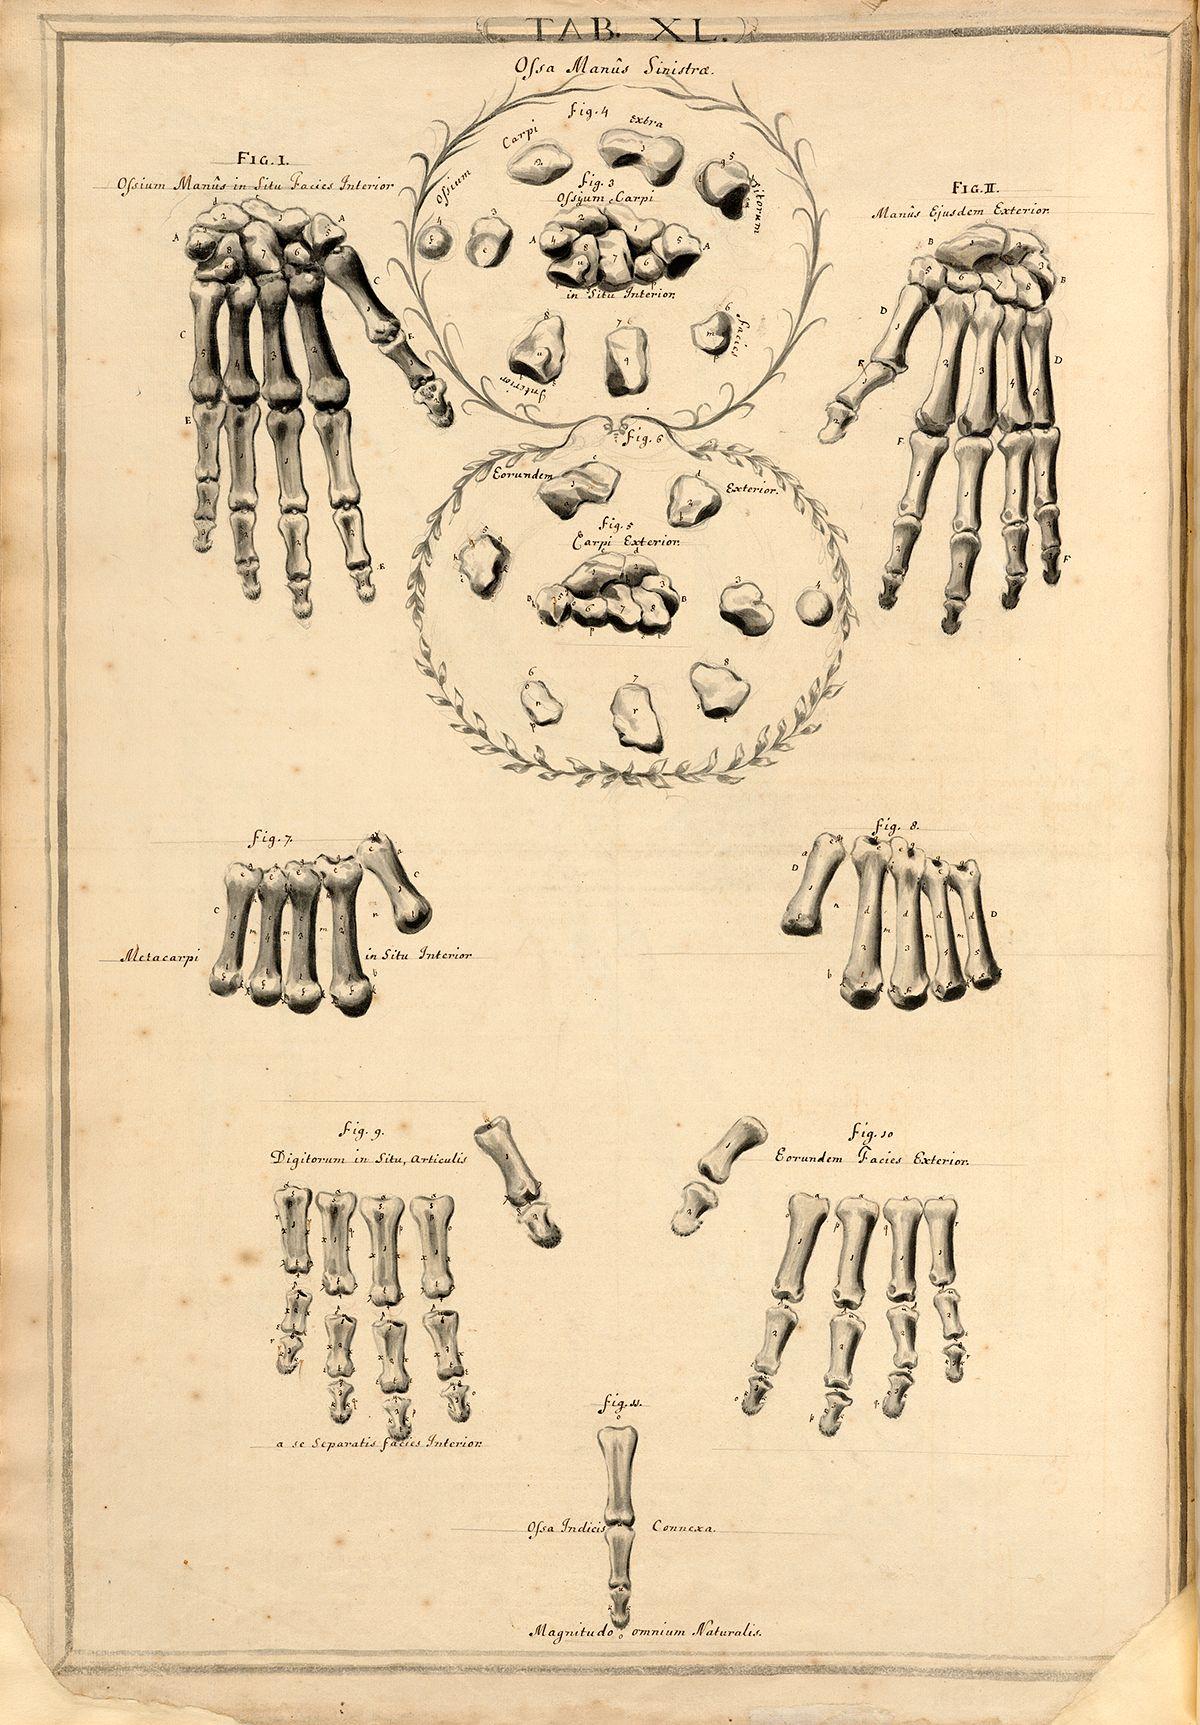 Bones of the Left Hand | • anatomy • | Pinterest | Anatomy and ...